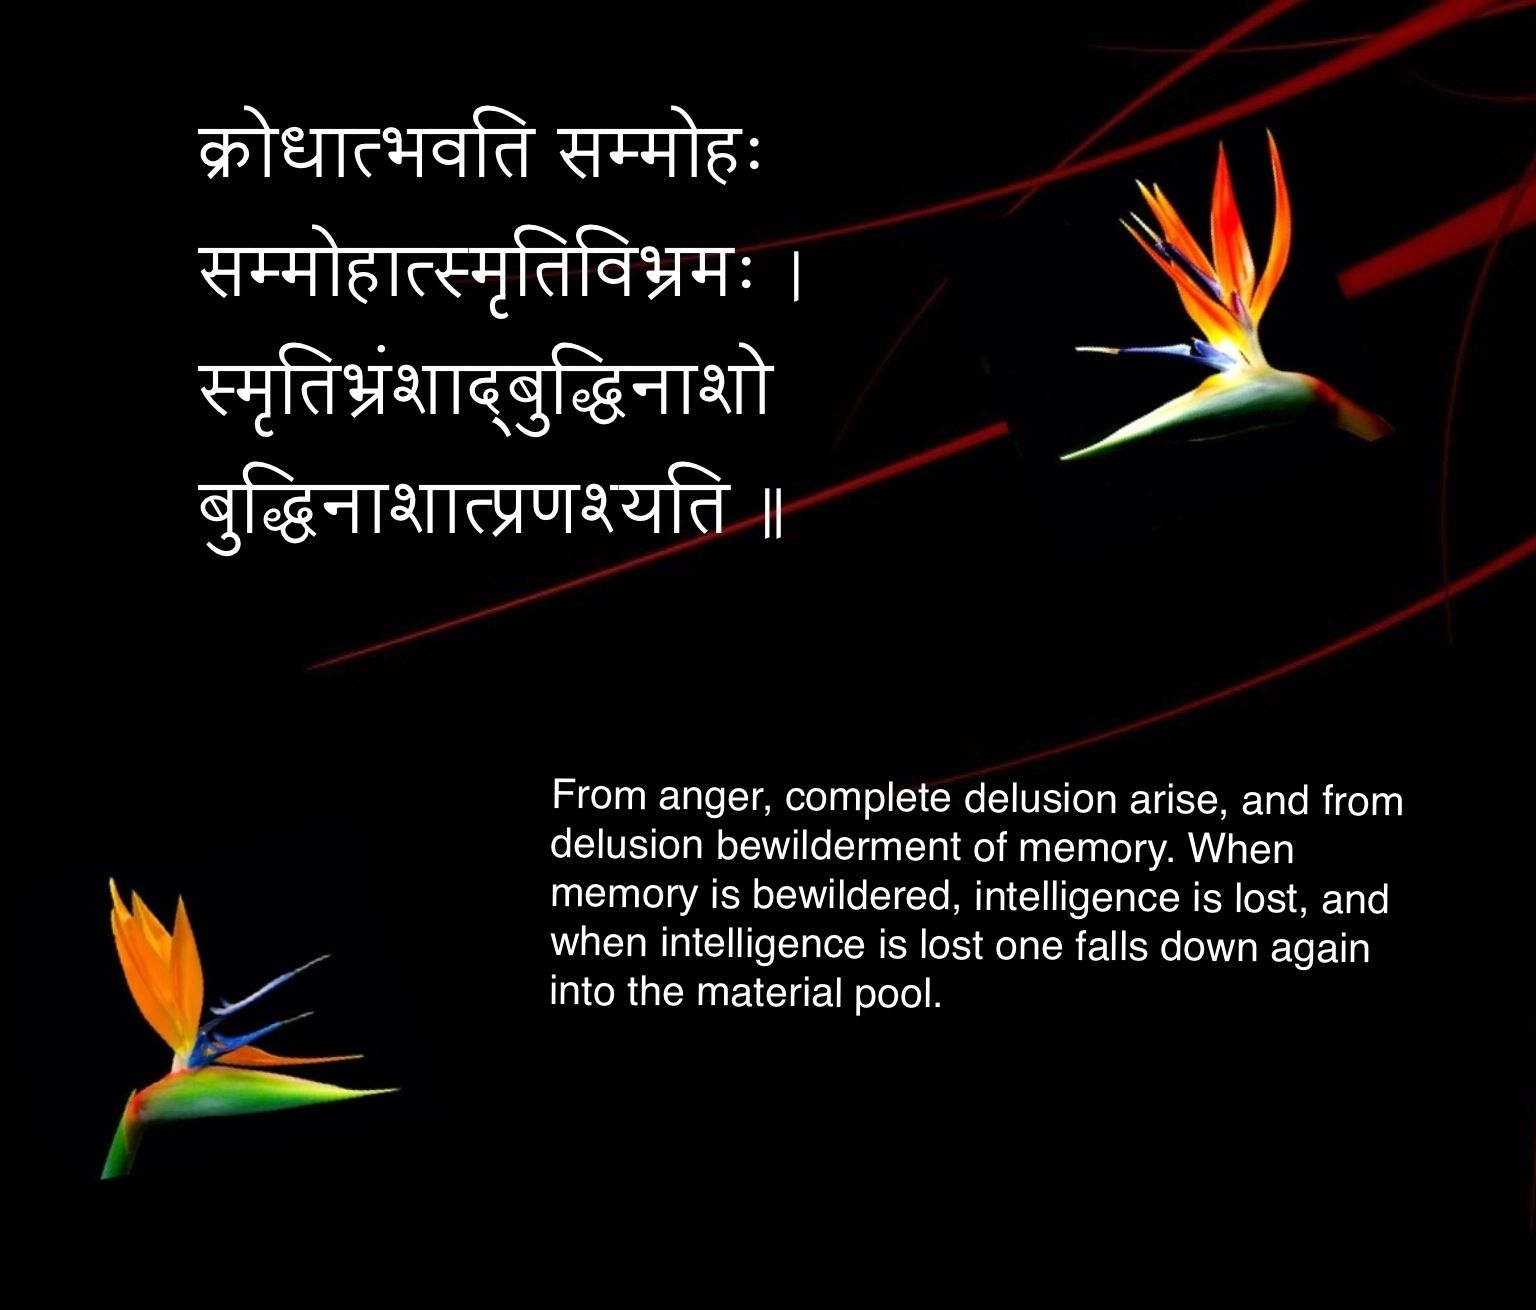 Sanskrit wedding quotes